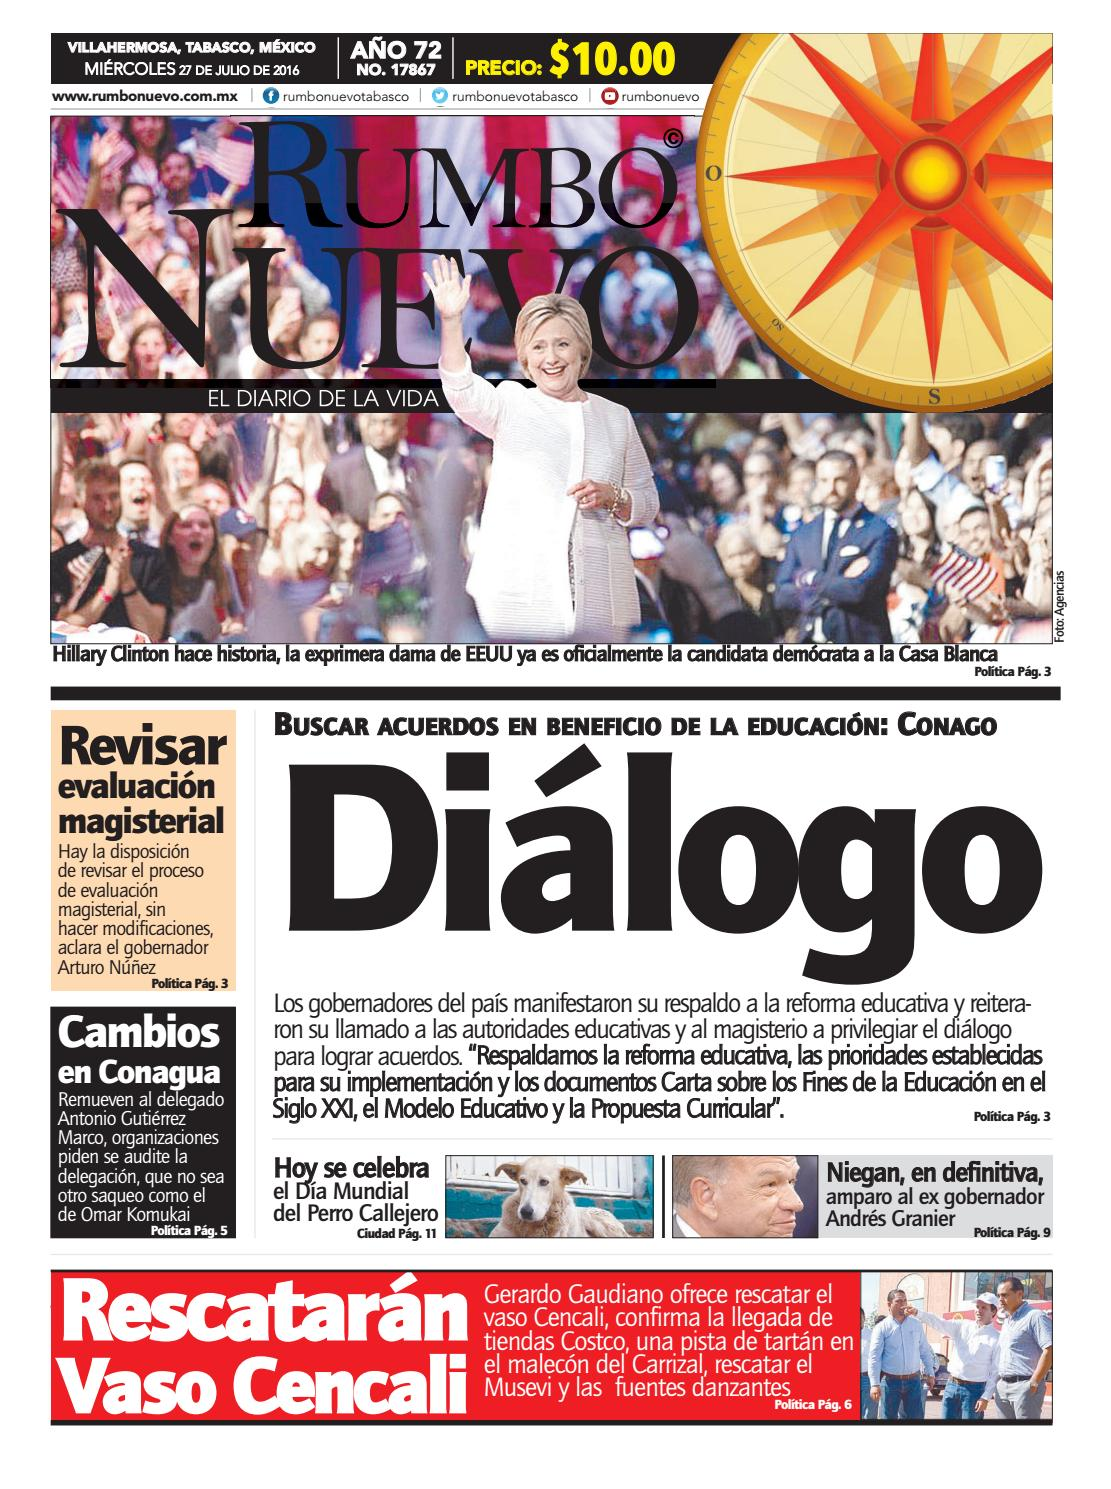 Rumbo Nuevo. Miércoles 27 de julio de 2016 by Grupo Rumbo Nuevo - issuu